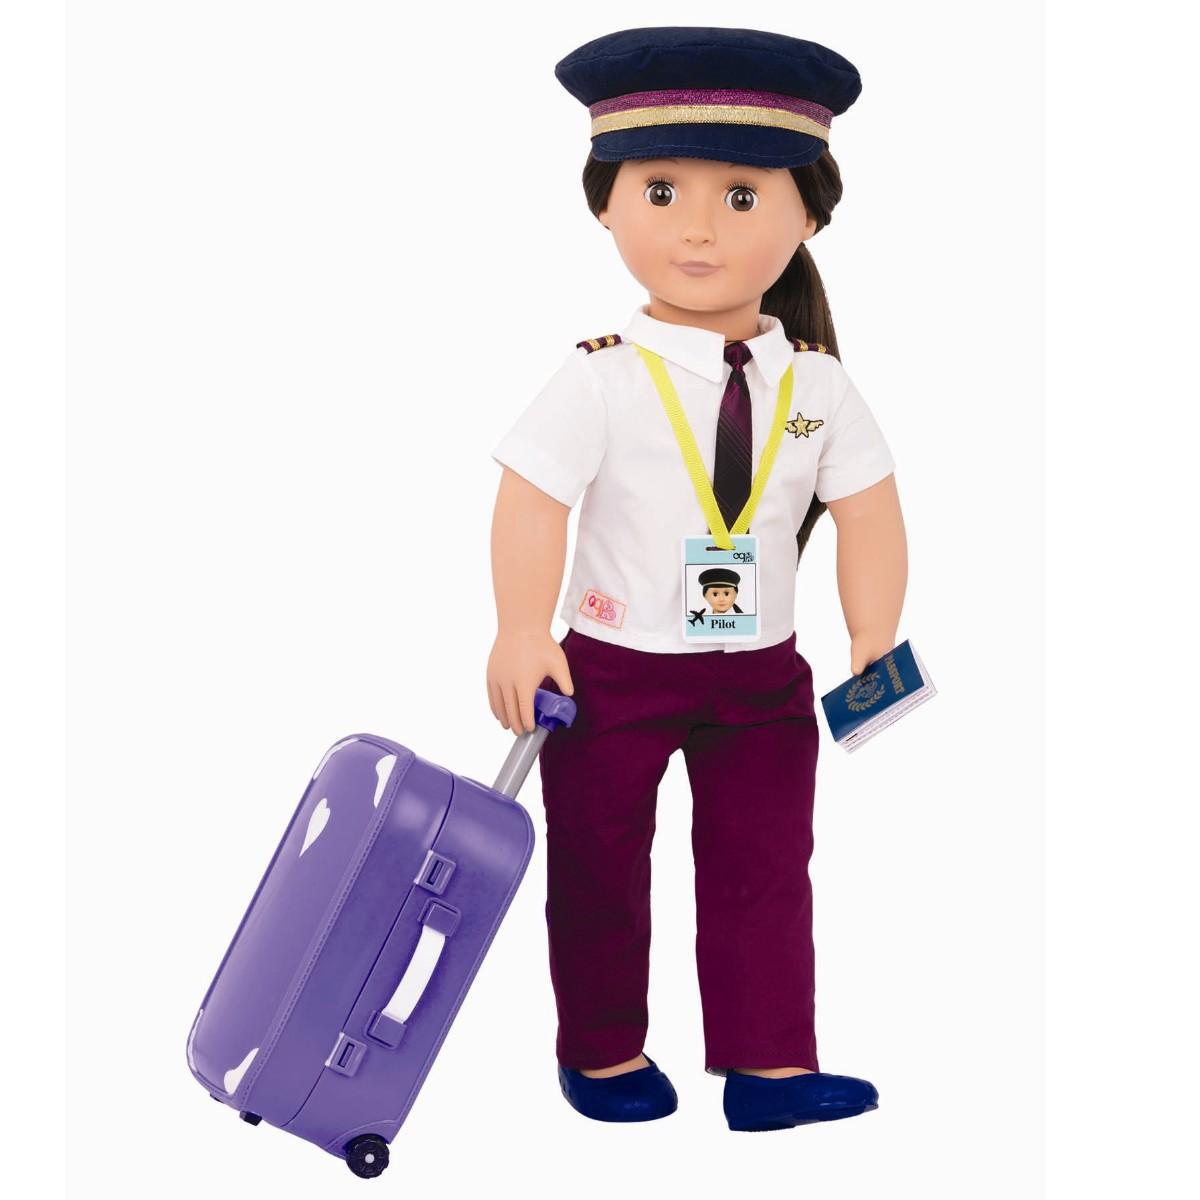 Our Generation dukke, Pilot Kaihily